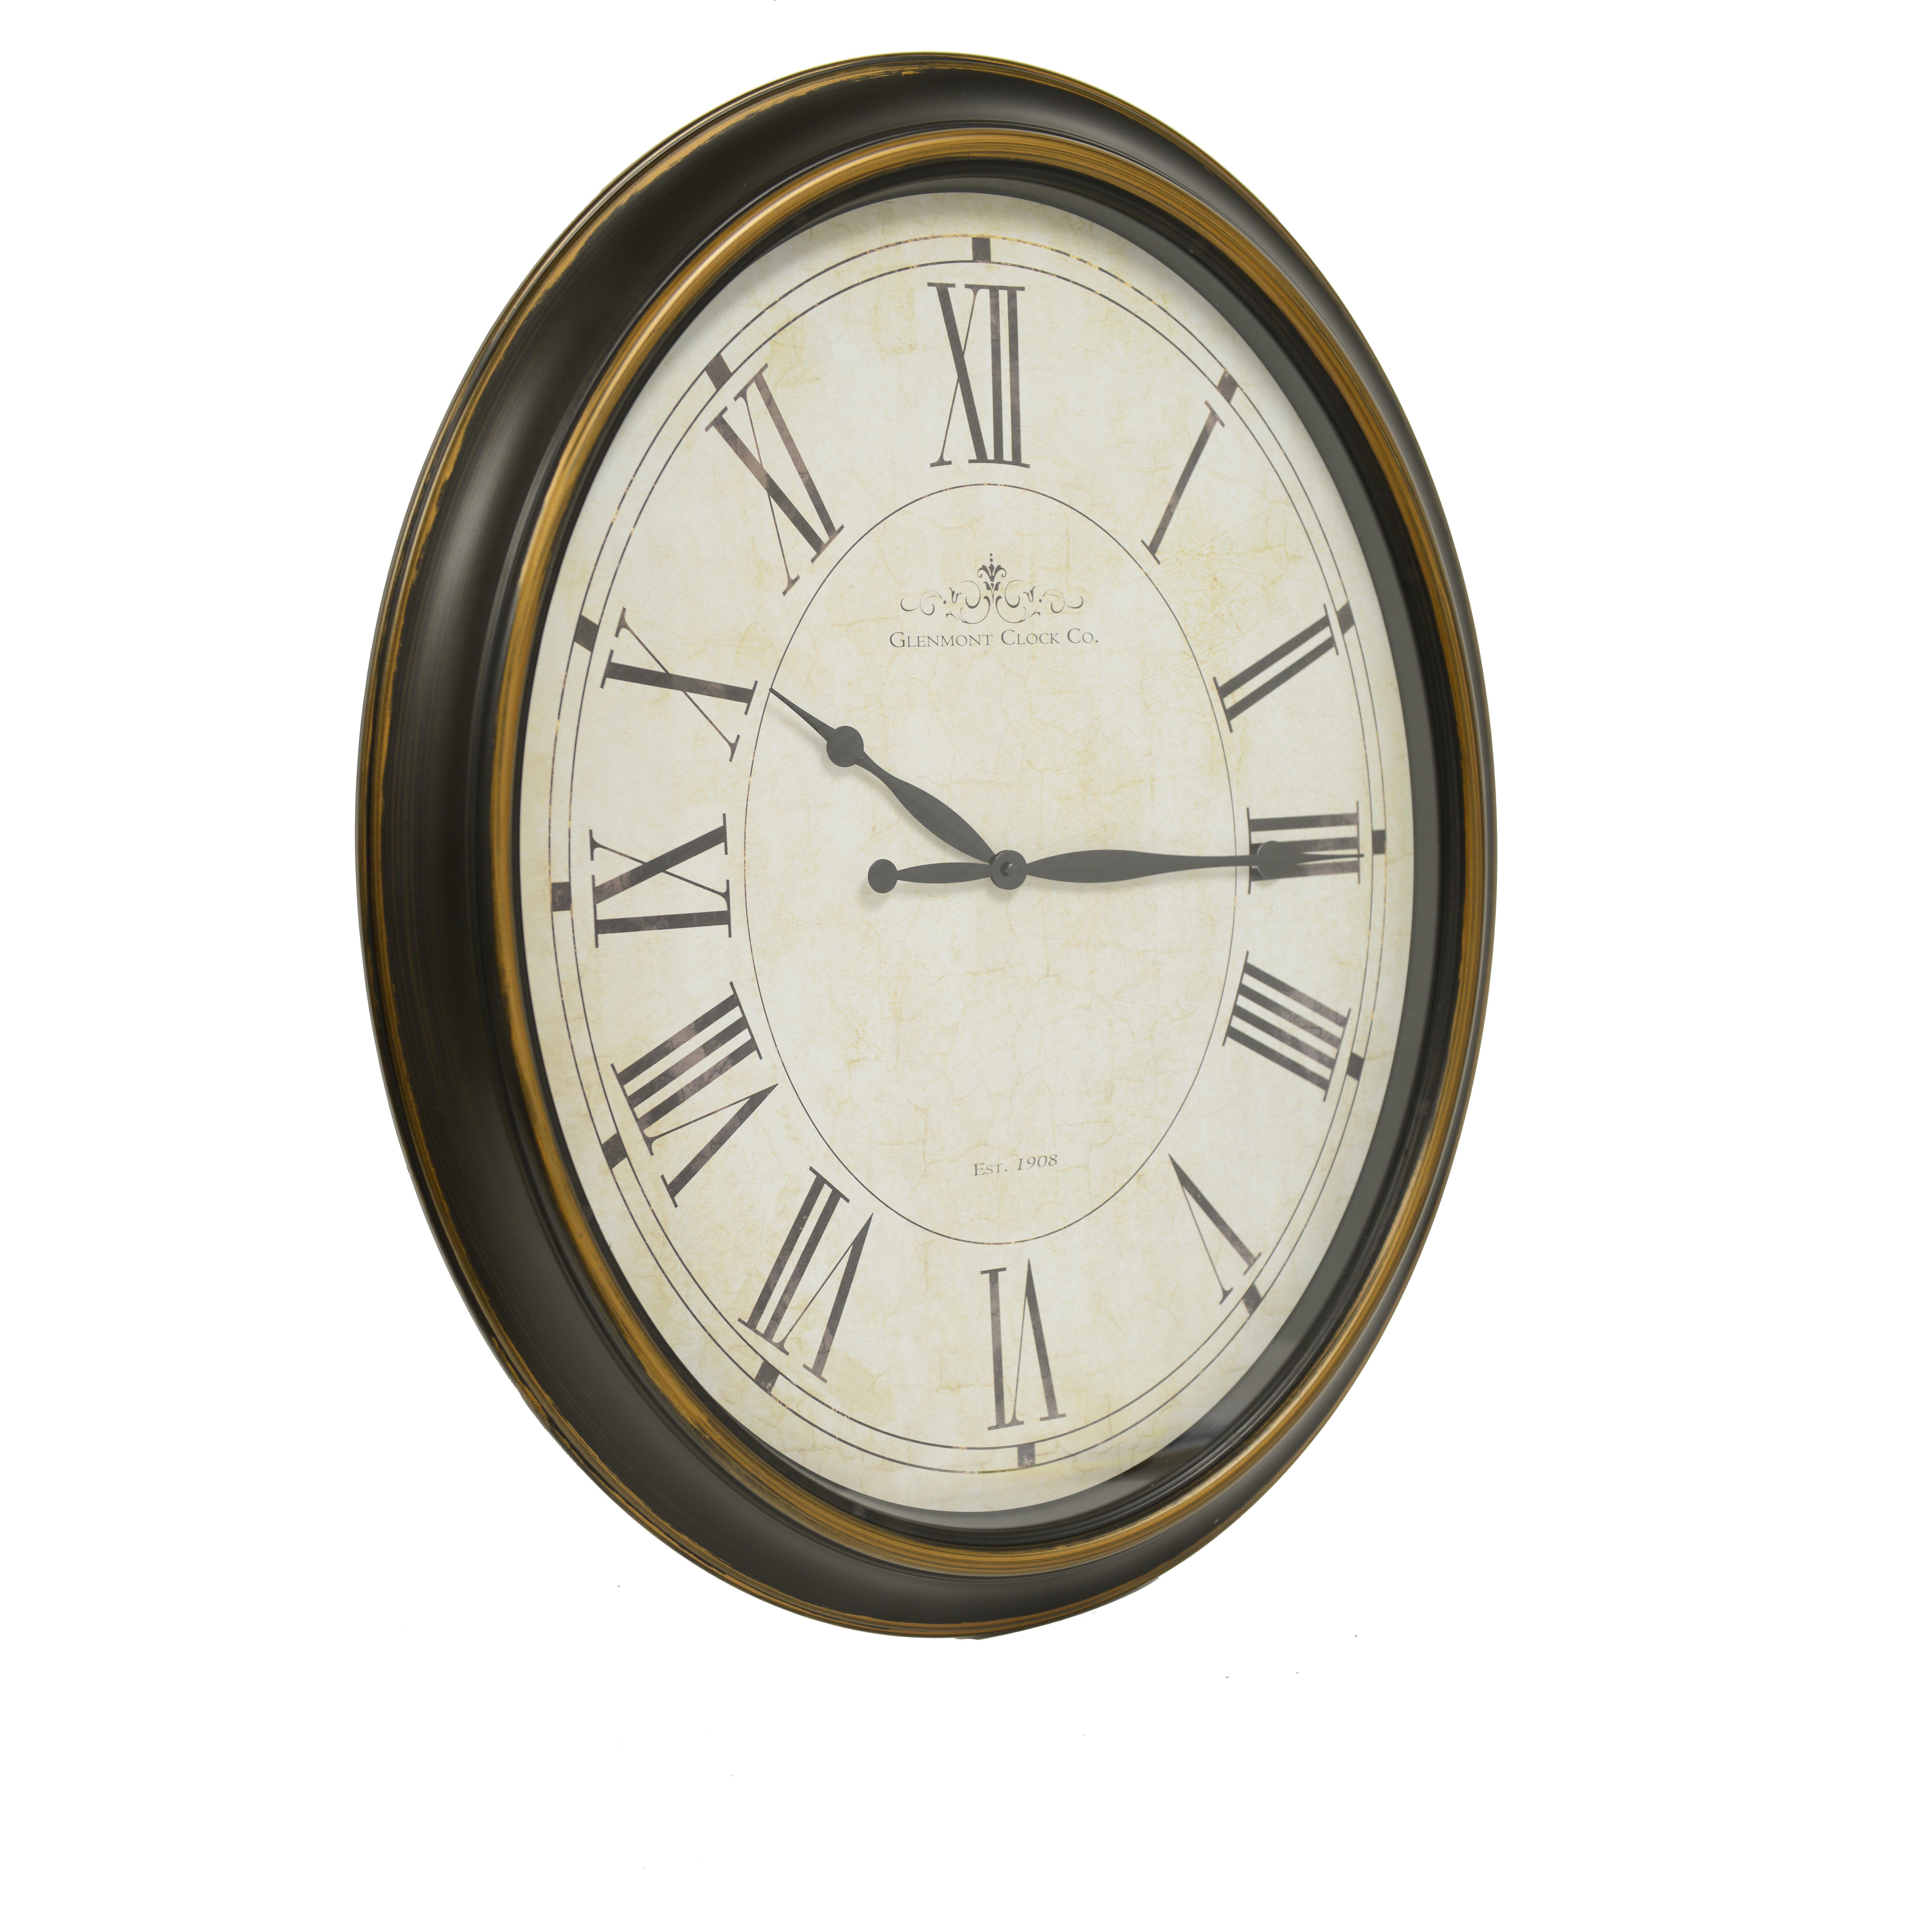 Decor Therapy Glenmont Wall Clock Amp Reviews Wayfair